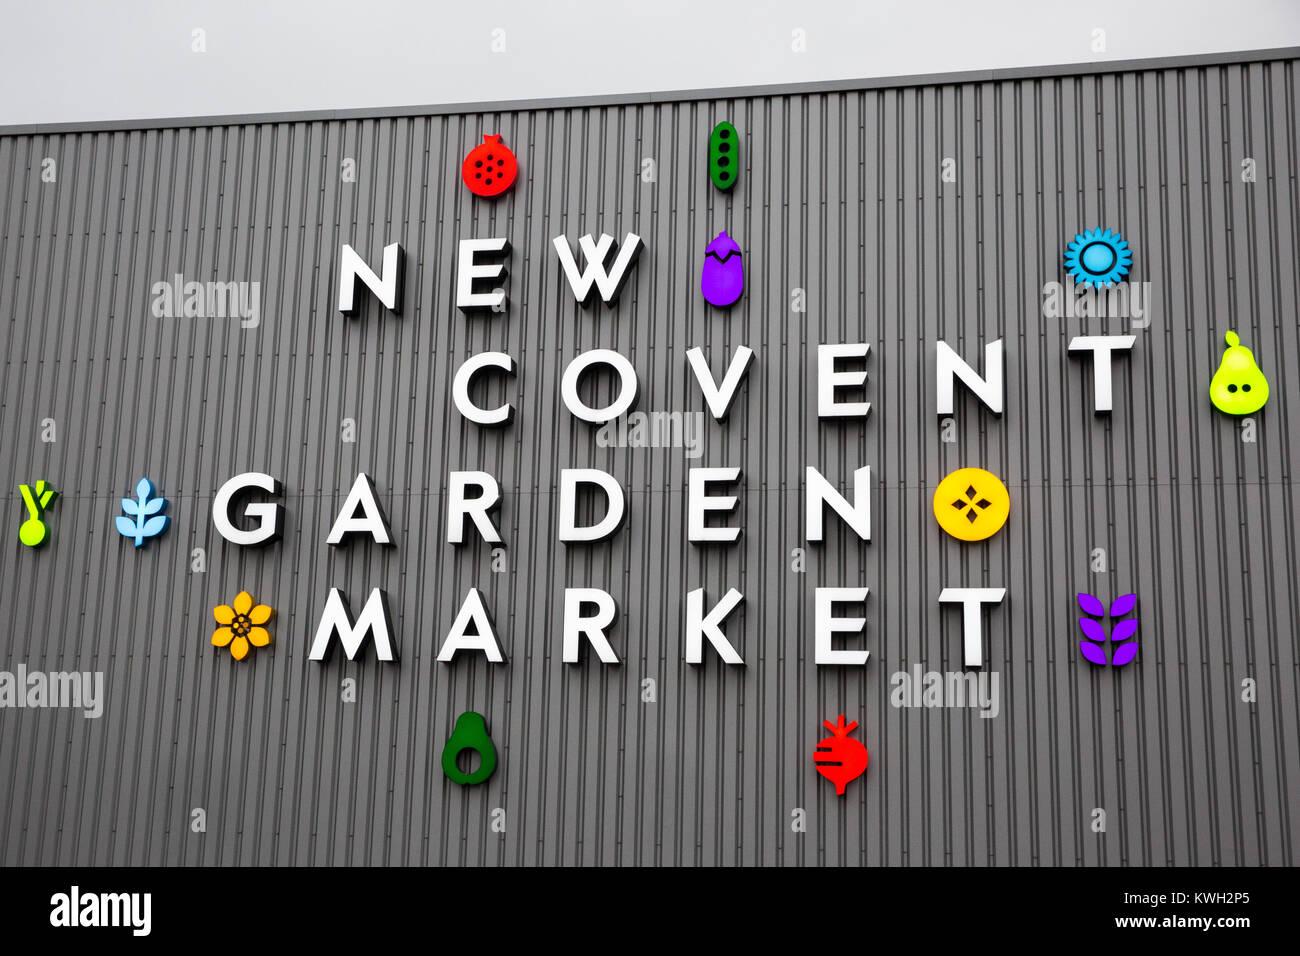 London, UK. 20th December, 2017. Signage for New Covent Garden Market at Nine Elms. - Stock Image